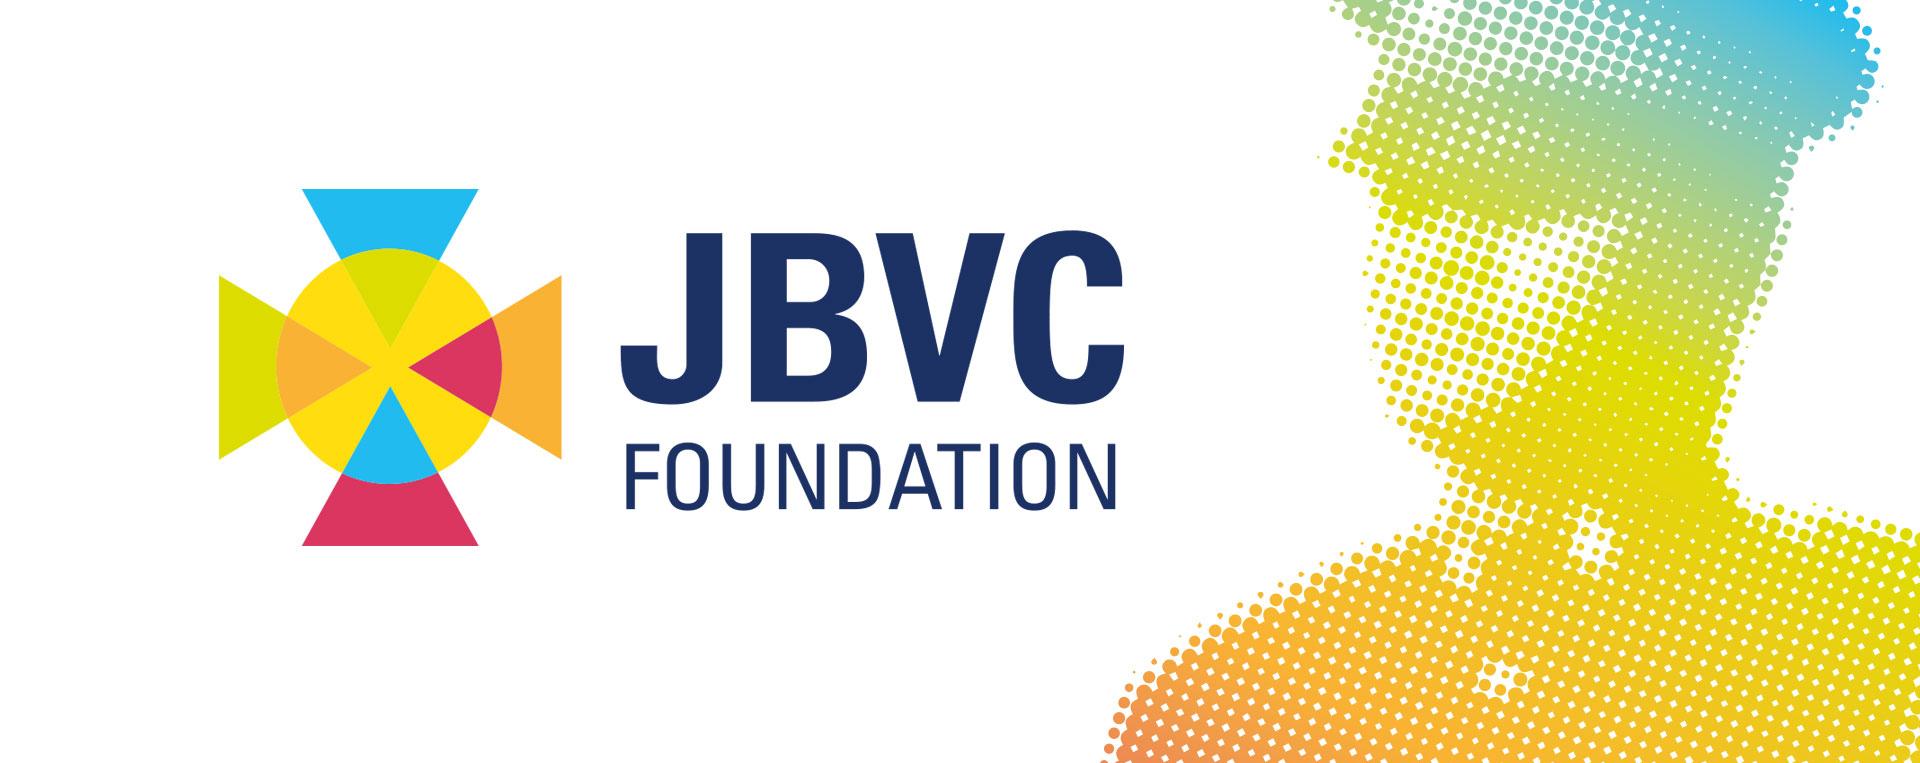 JBVC Foundation